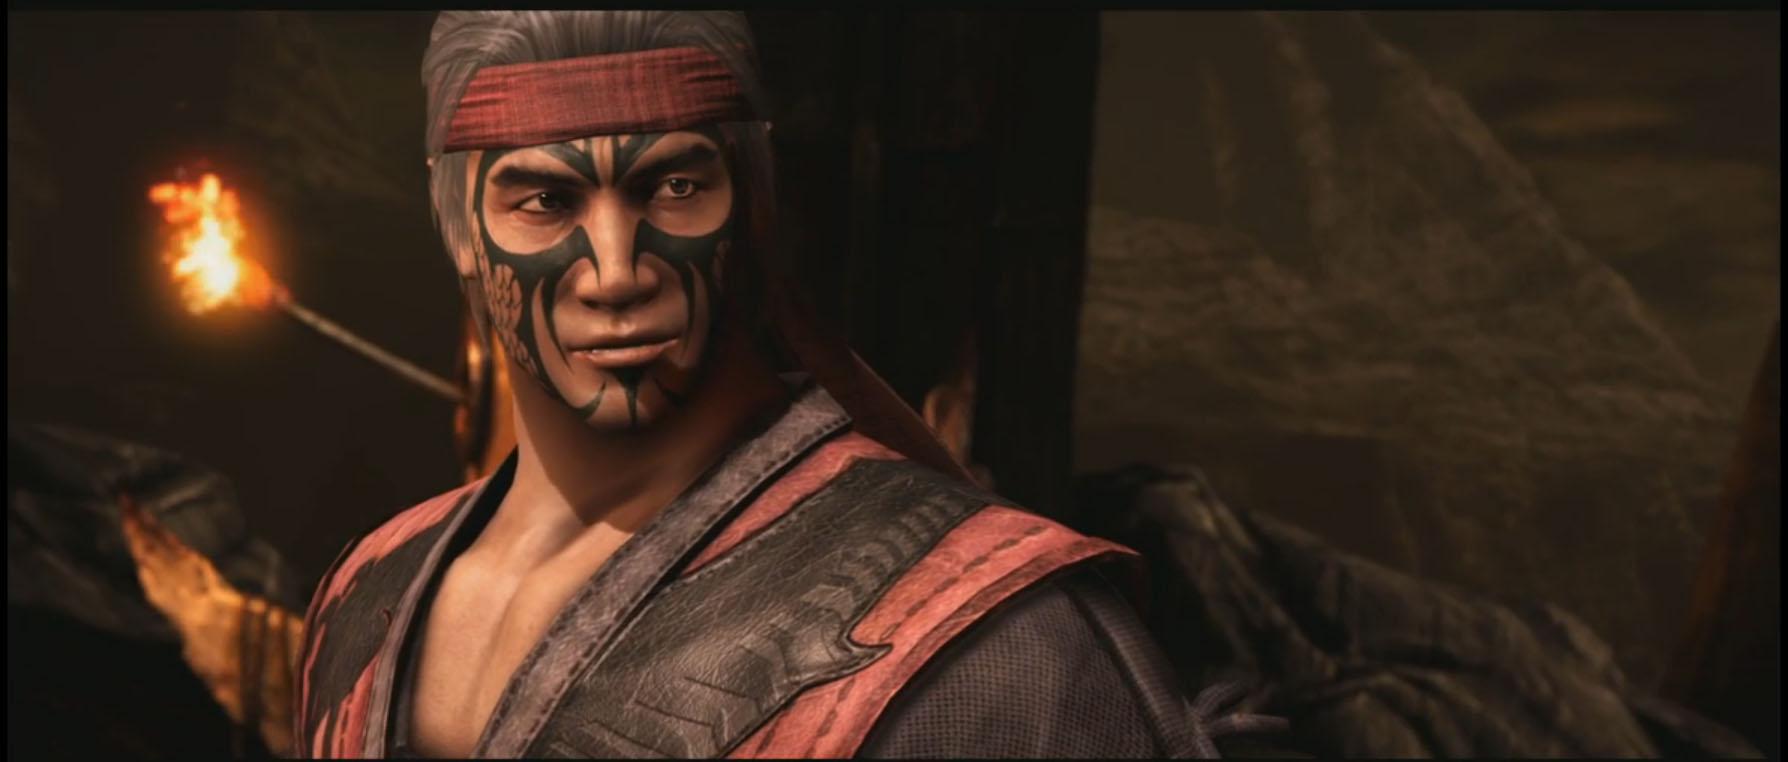 Mortal Kombat X Reveals Erron Black, Liu Kang, and Shinnok